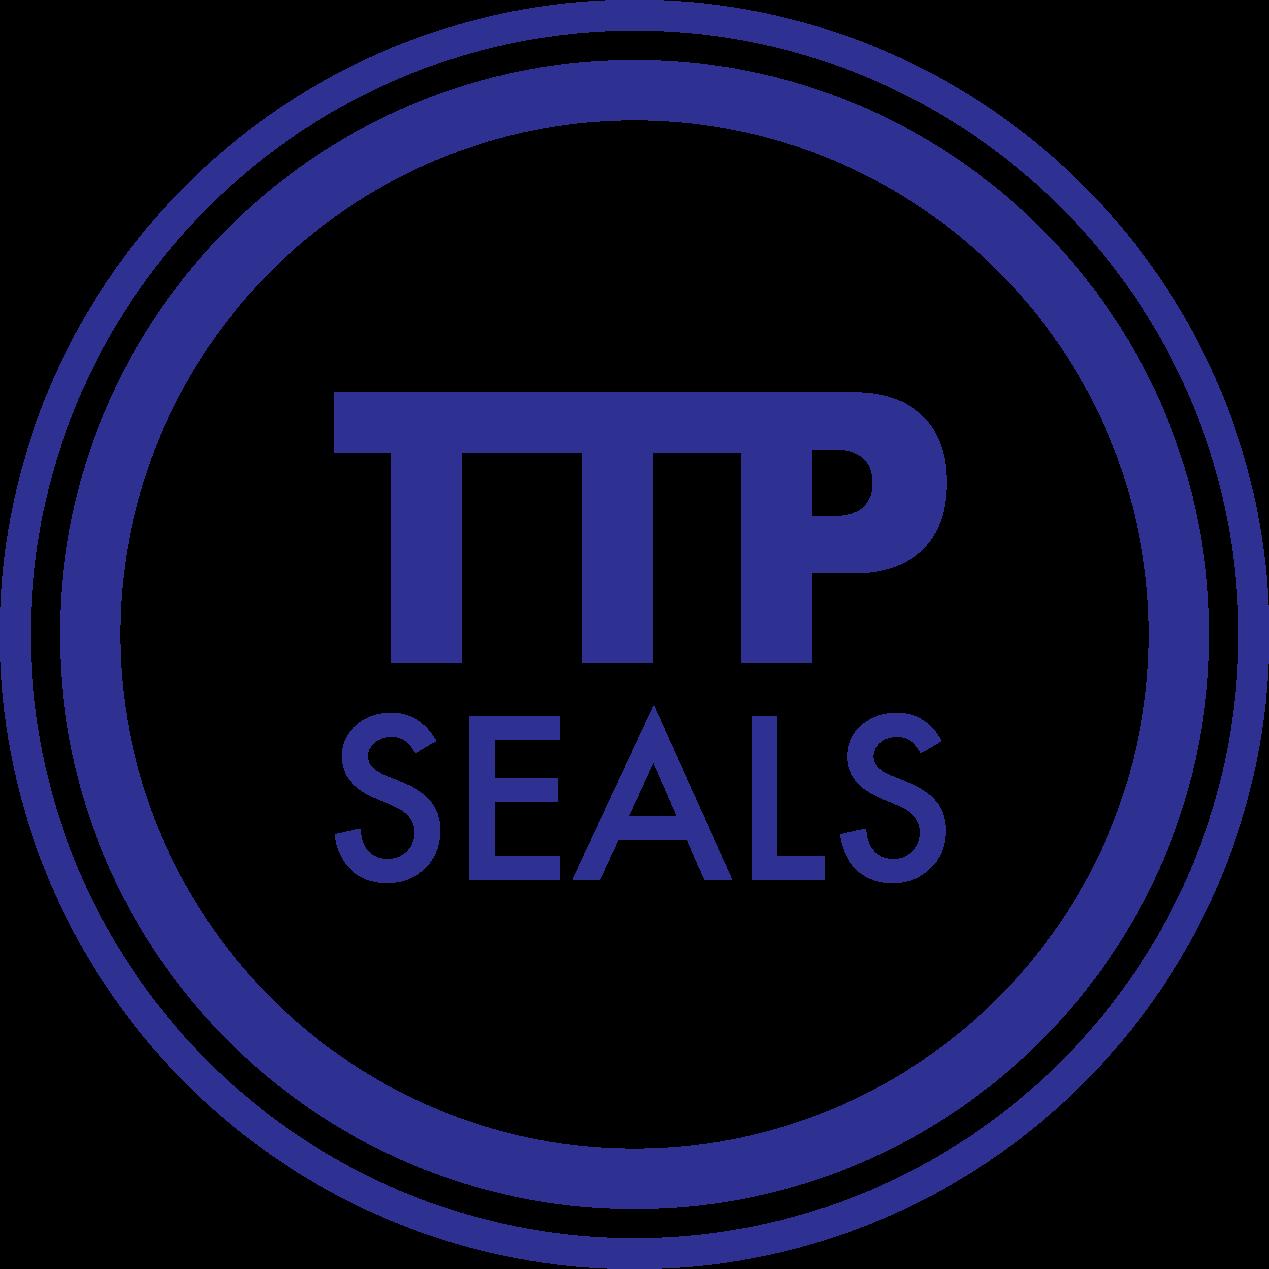 TTP SEALS logo